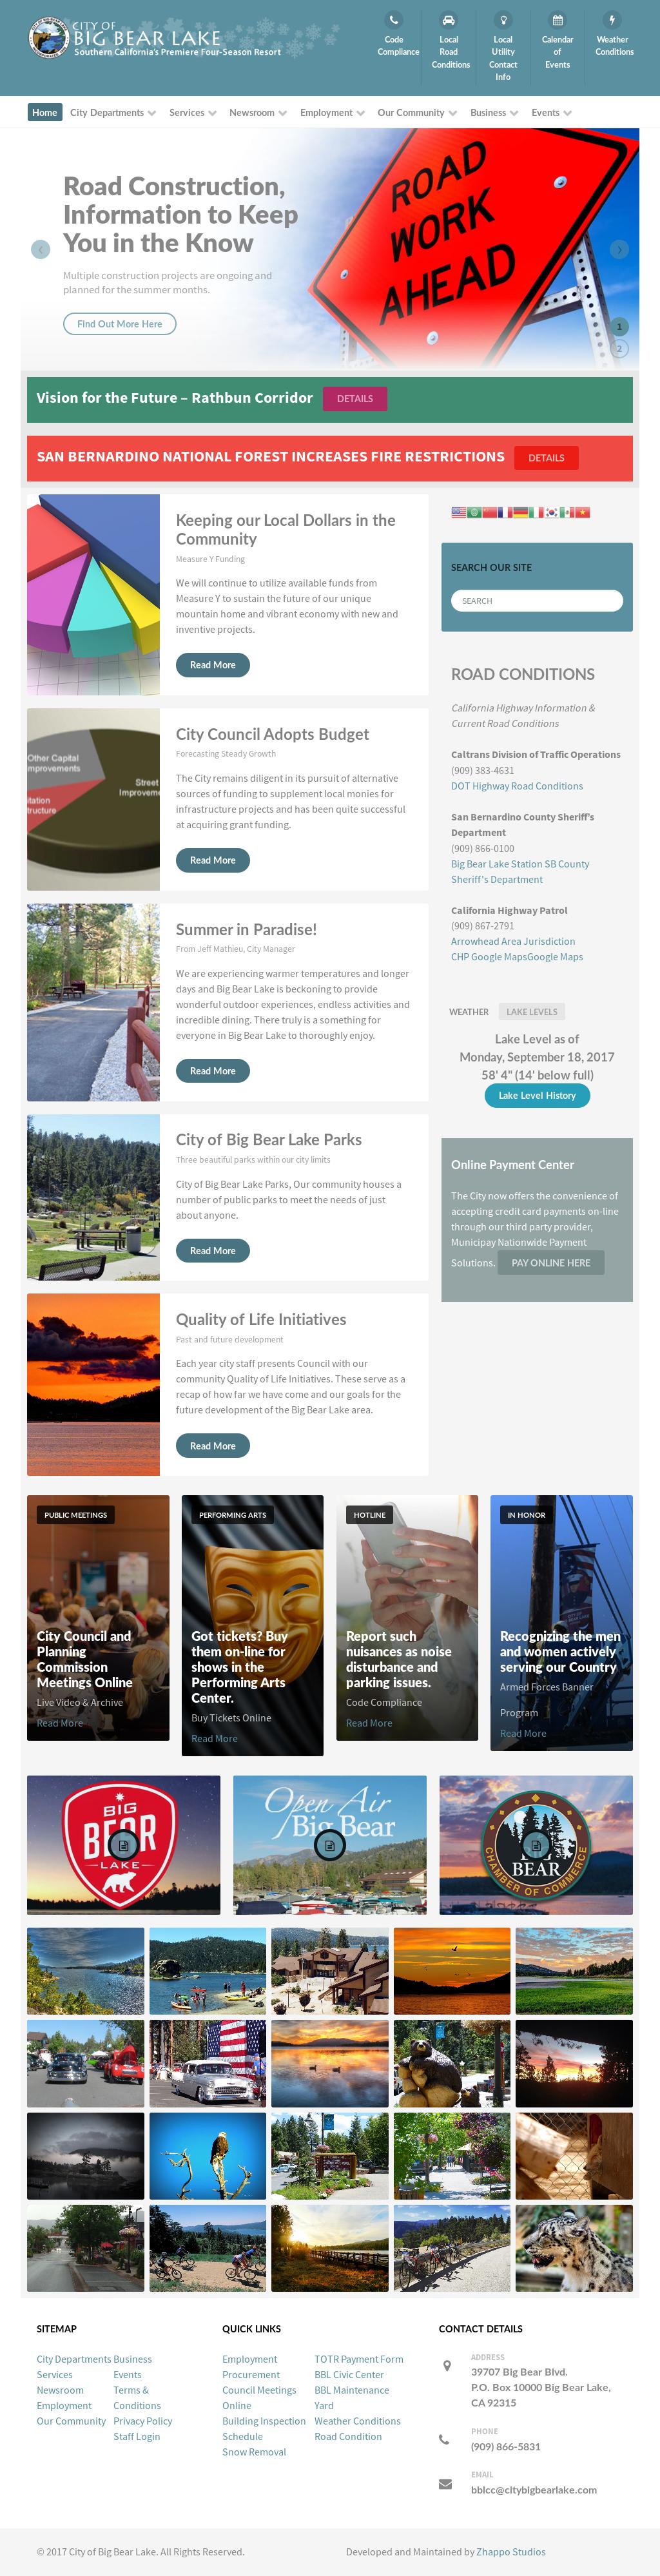 Big Bear California Map Google.City Of Big Bear Lake Competitors Revenue And Employees Owler